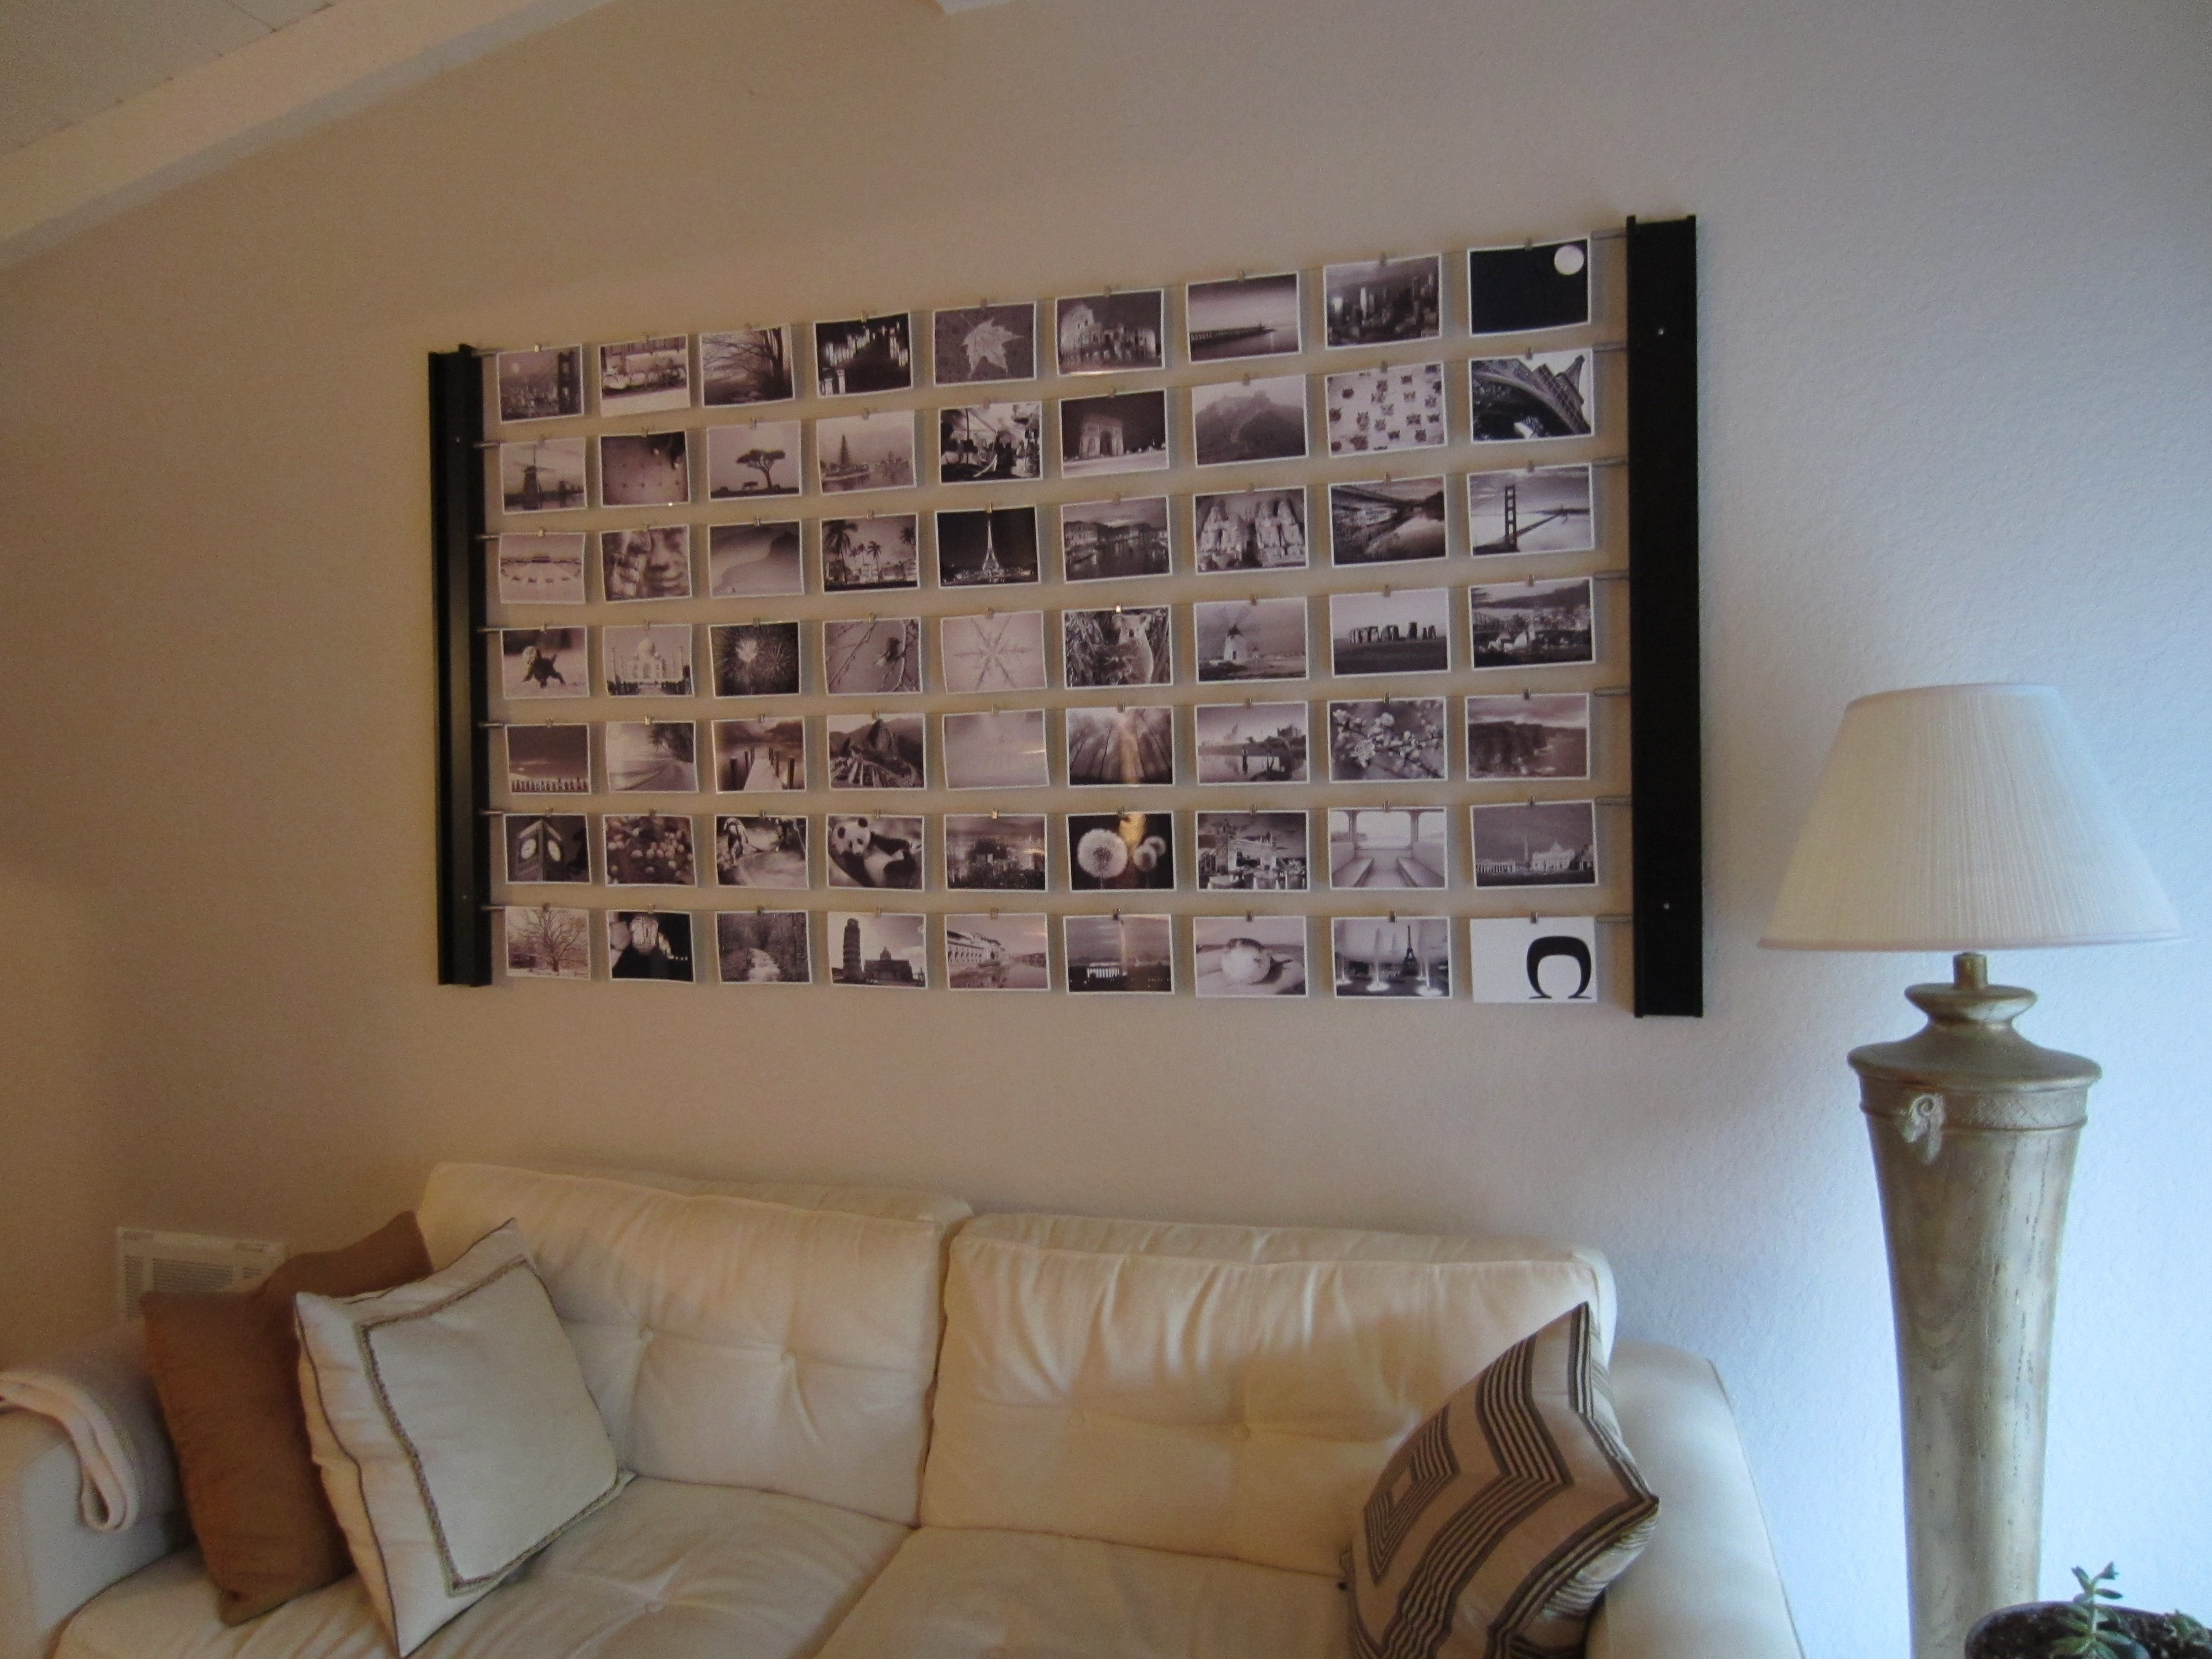 10 Fabulous Diy Decorating Ideas For Bedrooms impressive diy ideas for bedroom diy tumblr room decor ideas tumblr 2020